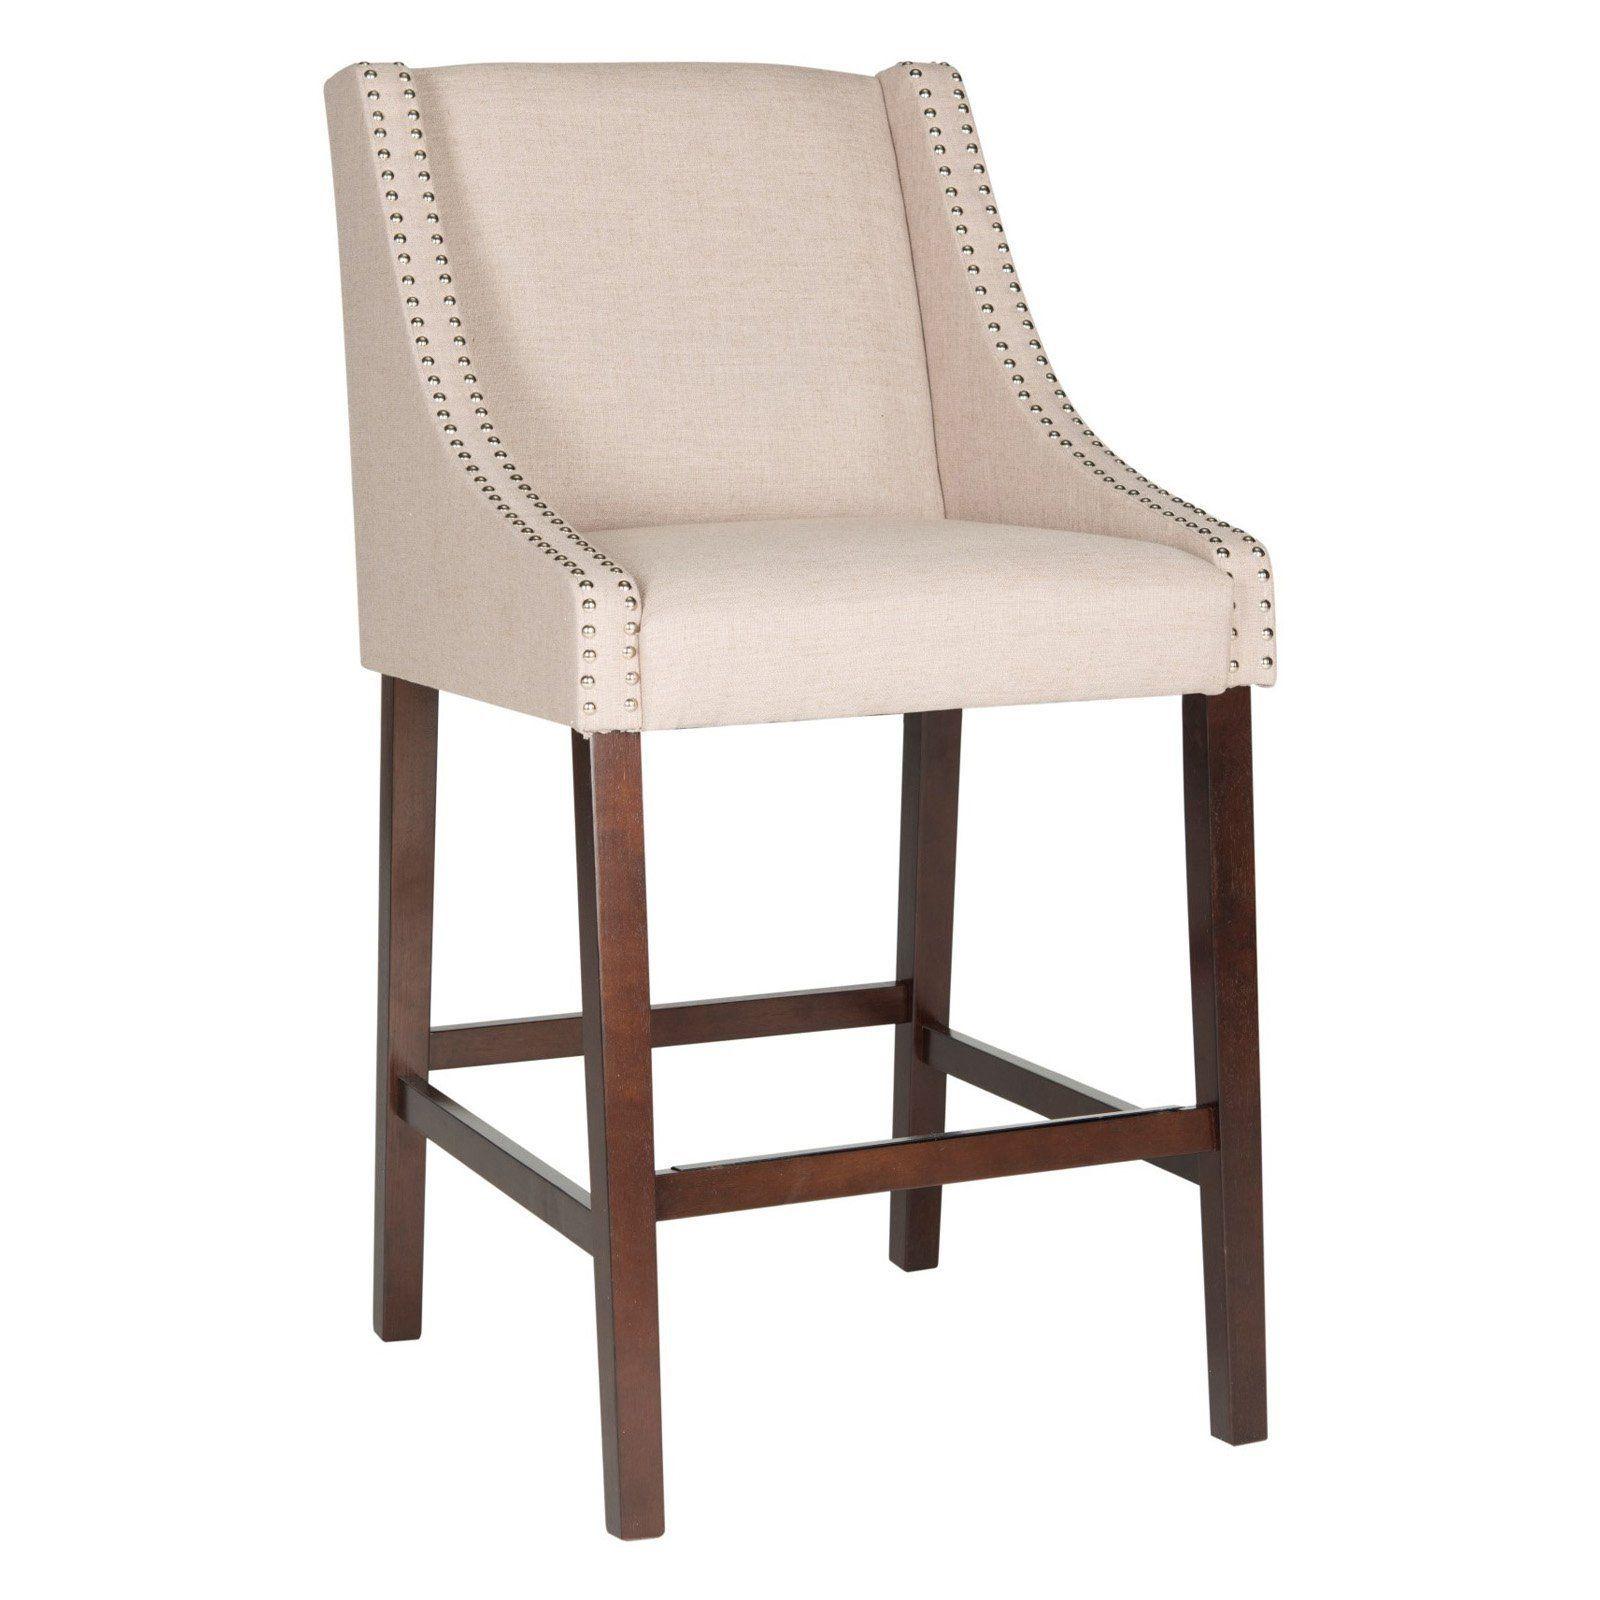 Safavieh Dylan 29 in. Bar Stool Bar stools, Bar stool